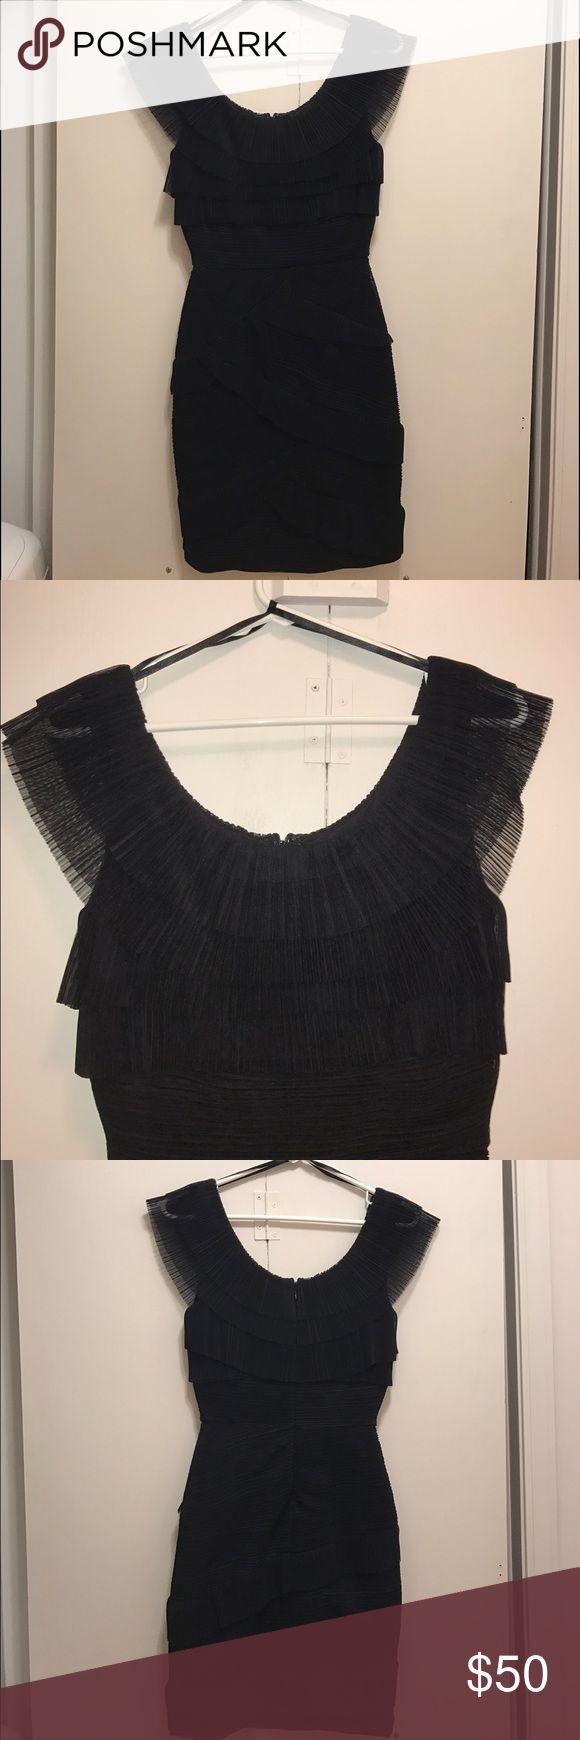 BCBG dress Worn once BCBG Dresses